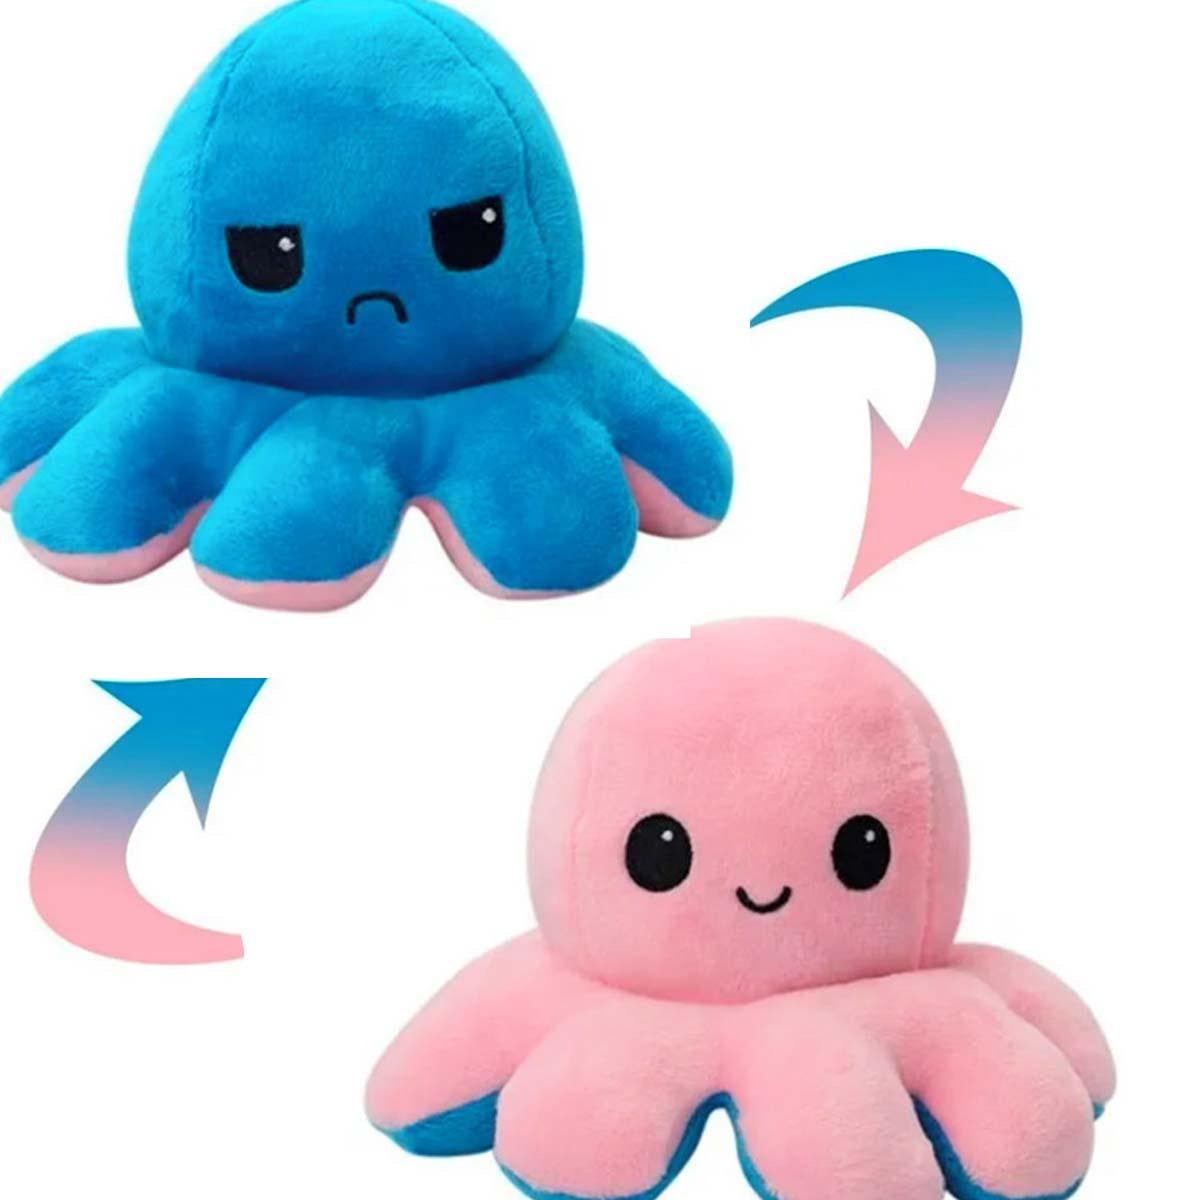 Pelúcia Polvo Humor Médio Azul e Rosa Mega fofo